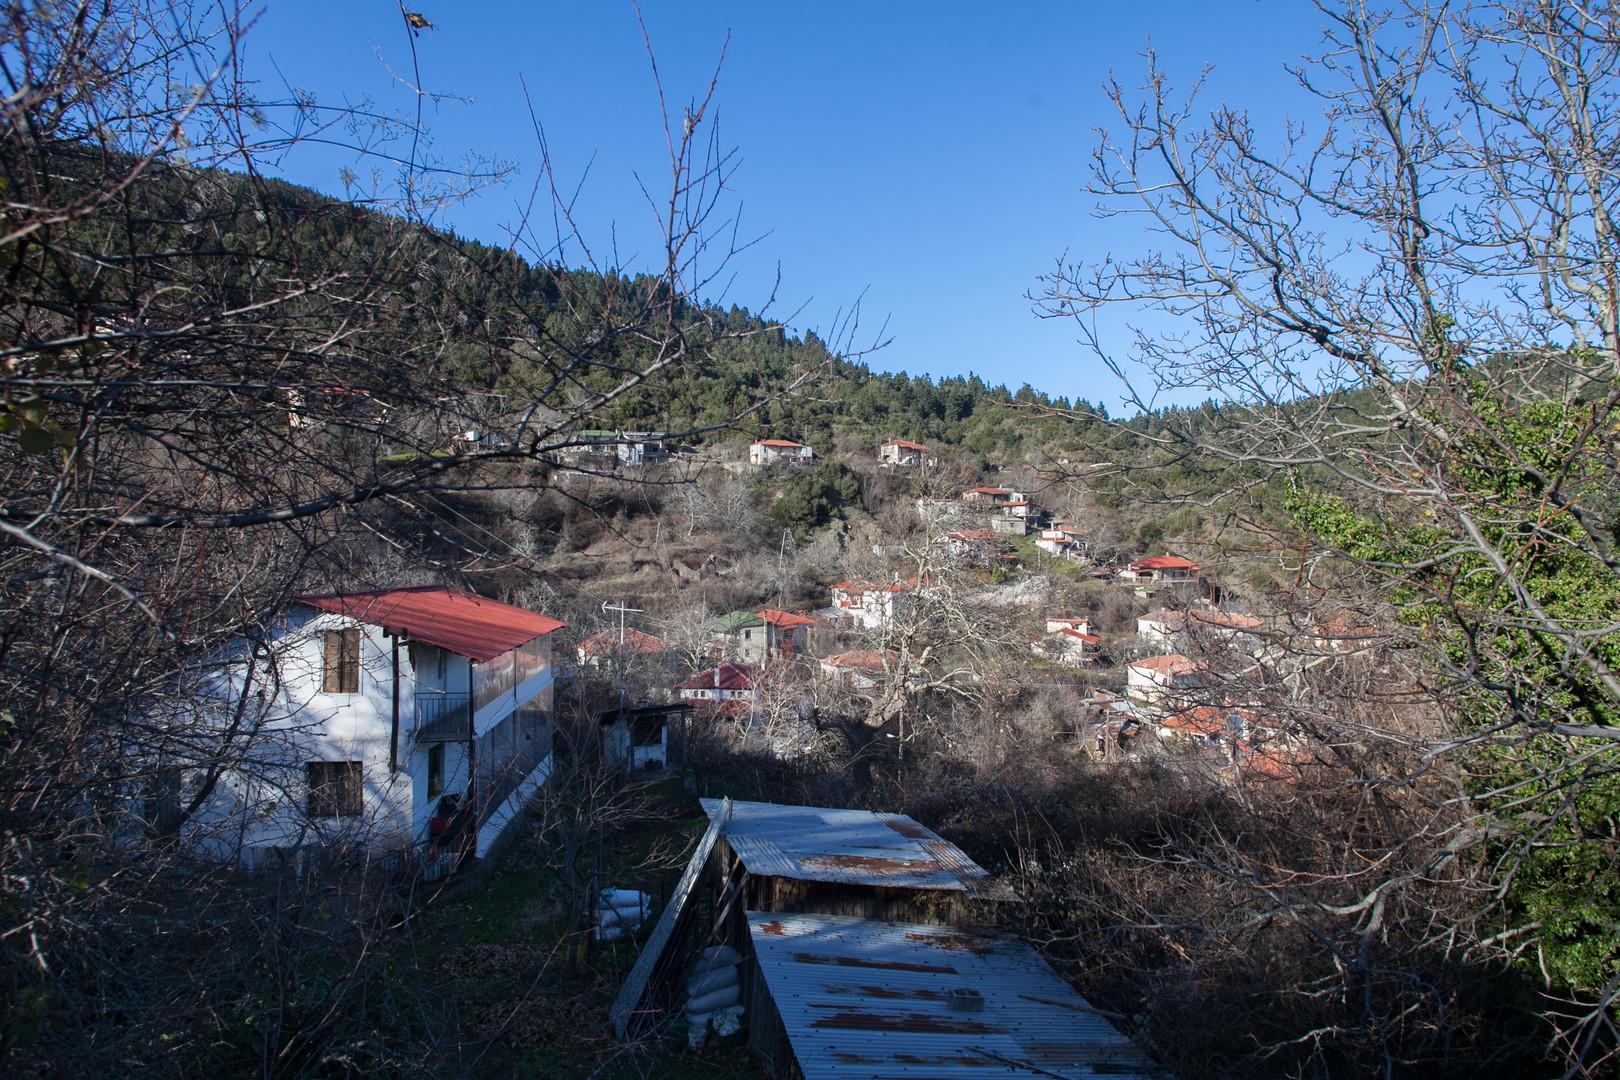 View on the village of Pavliani, Mount Iti, Attica, Greece, December 2017